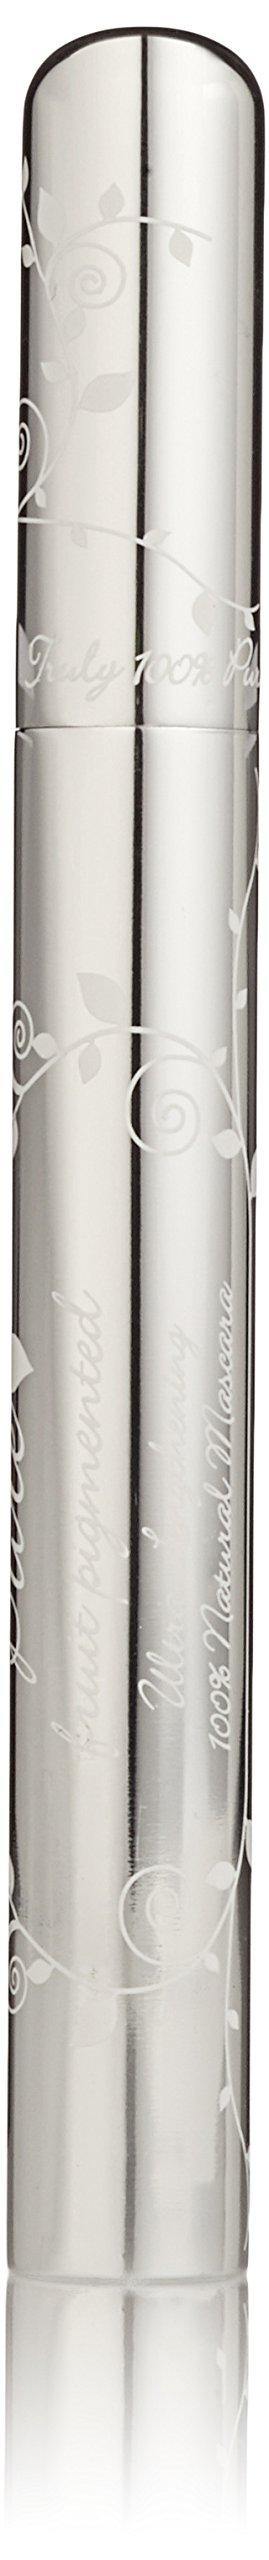 100% Pure Fruit Pigmented Ultra Lengthening Mascara, Black Tea, 0.24 oz.